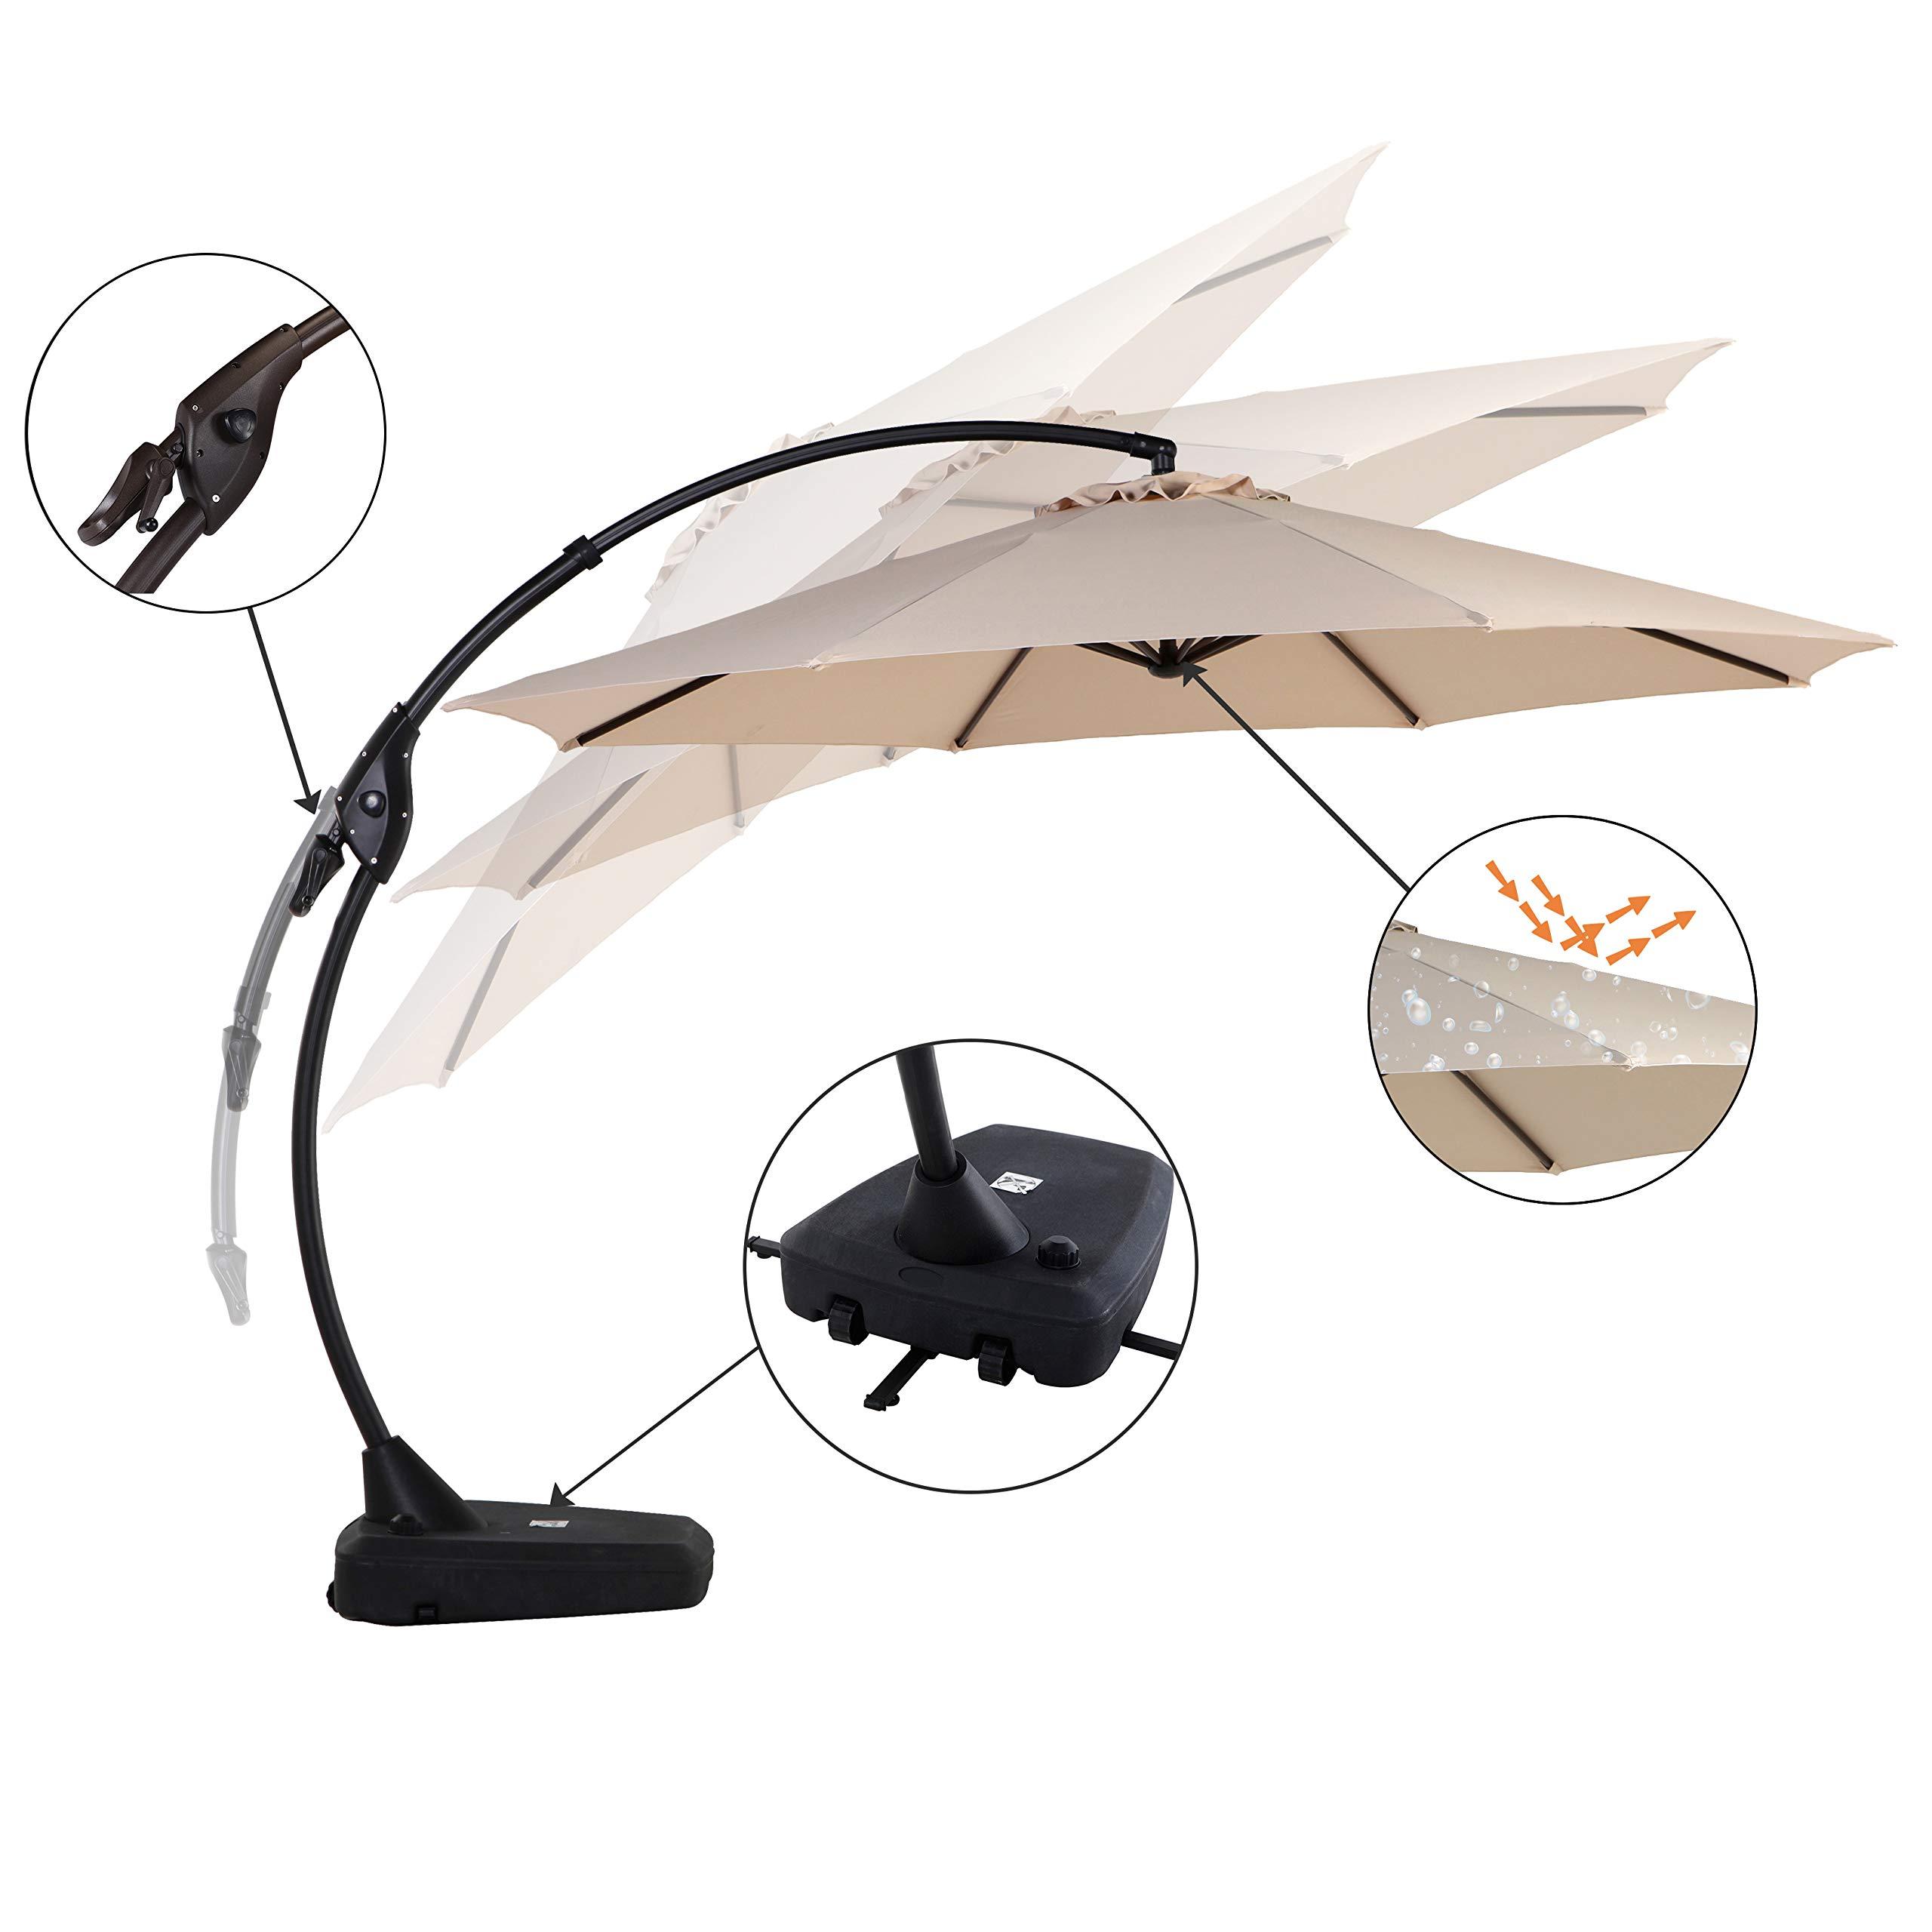 Grand Patio Napoli Deluxe 11 FT Curvy Aluminum Offset Umbrella, Patio Cantilever Umbrella with Base, Champagne by Grand Patio (Image #4)